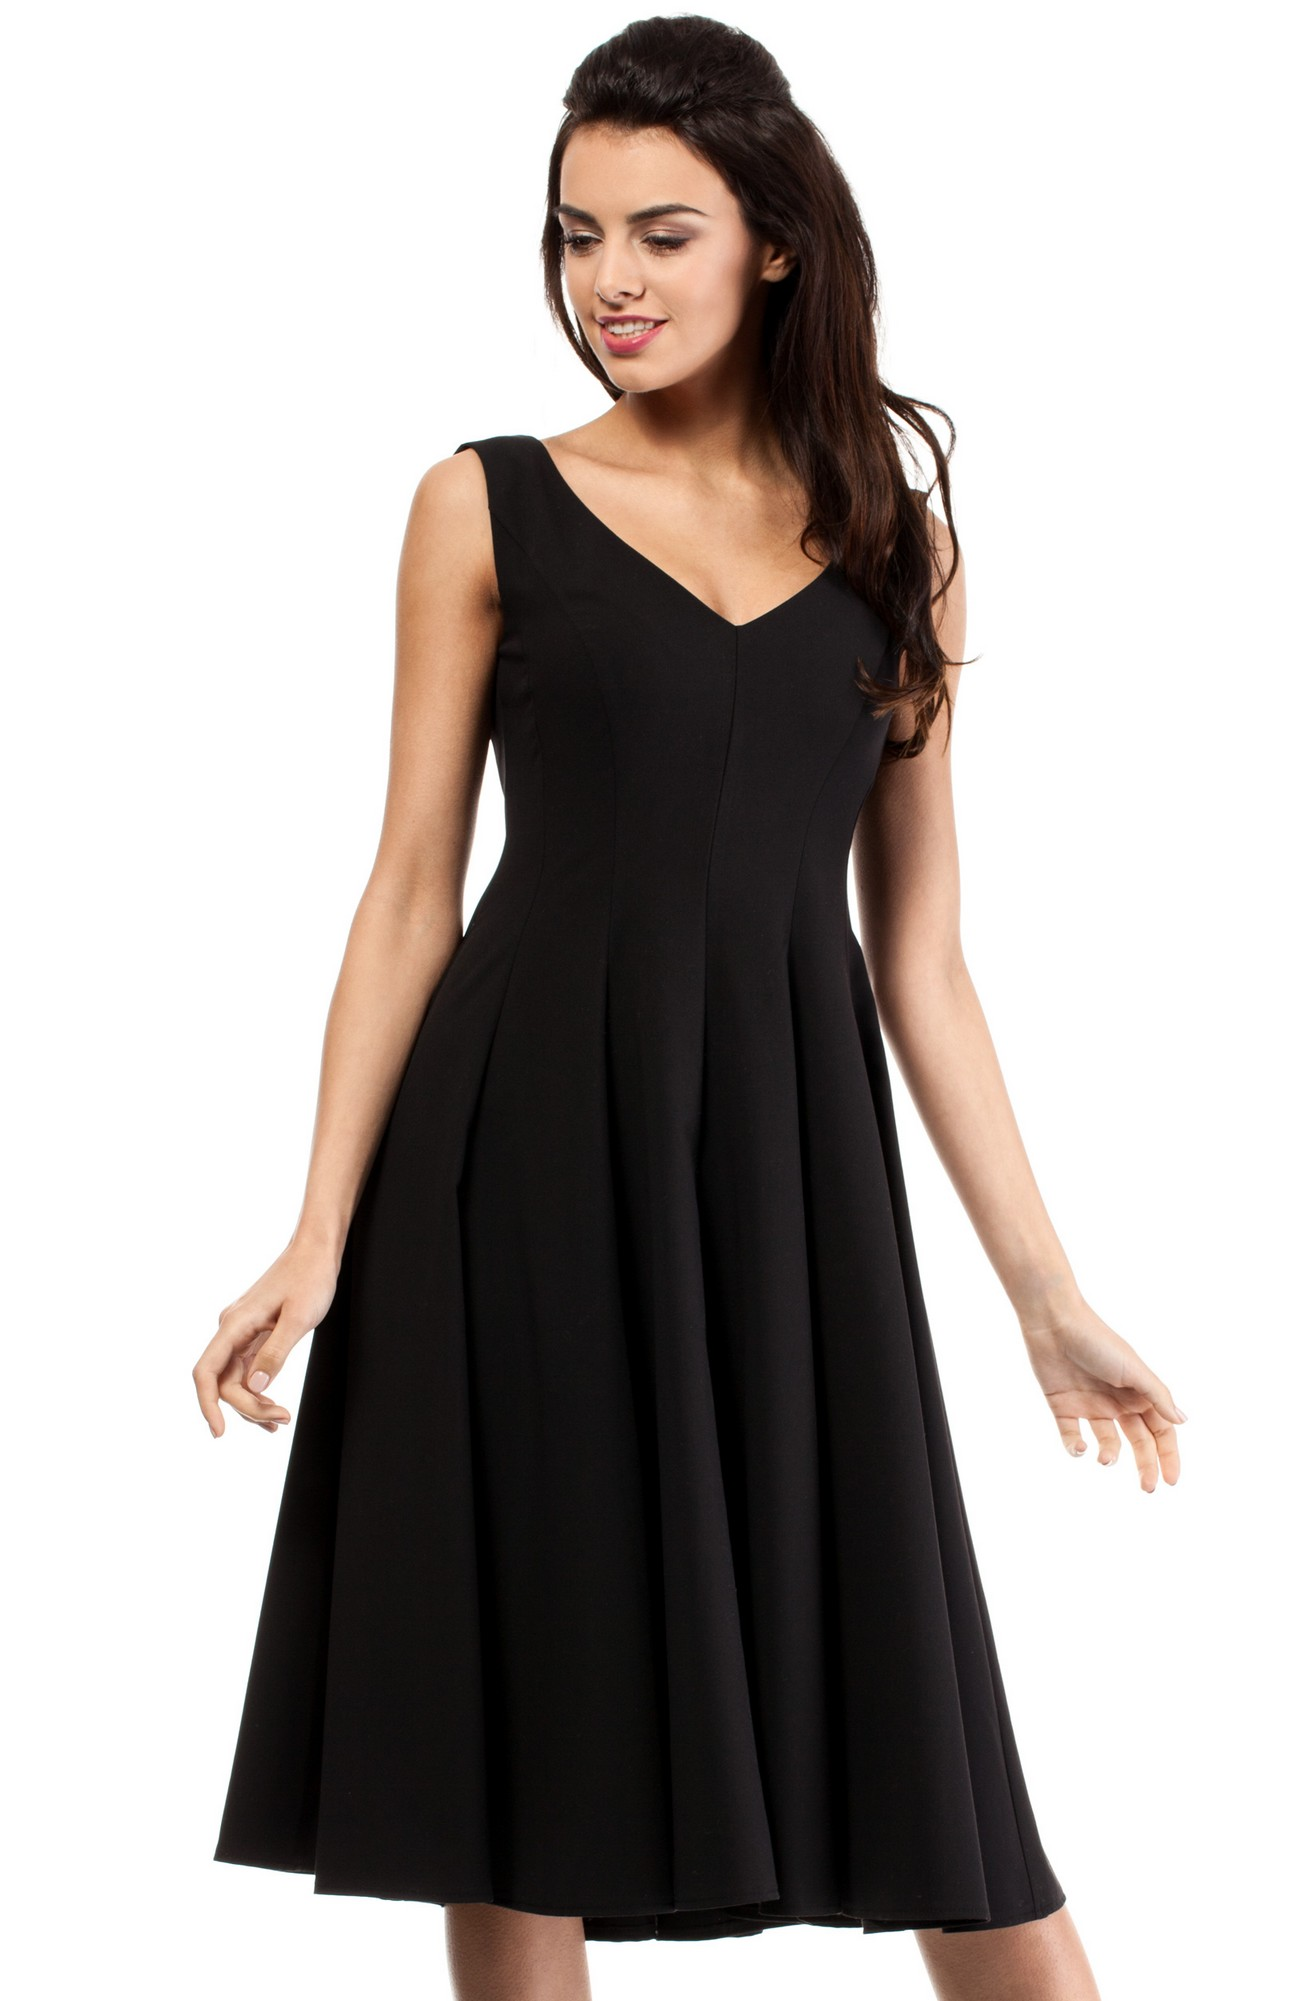 Black cocktail dress strip video